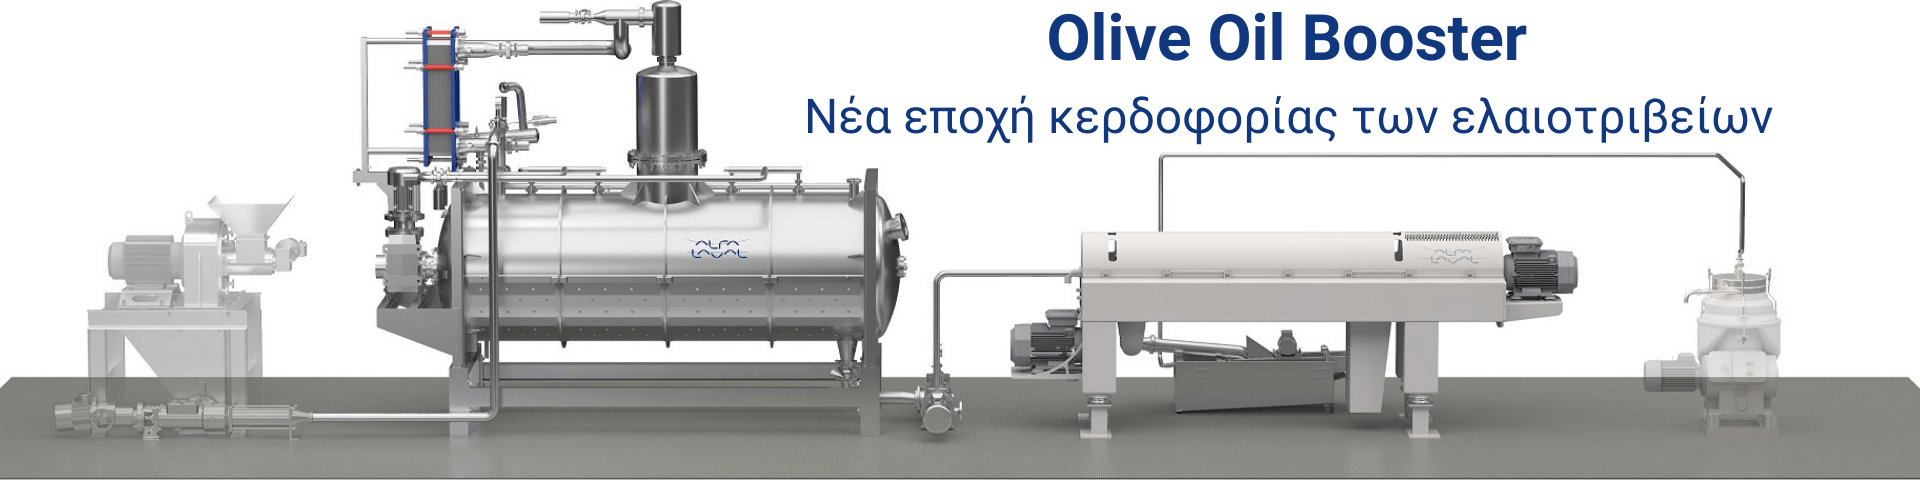 Olive Oil Booster - Η επανάσταση στη μάλαξη της ελαιόπαστας